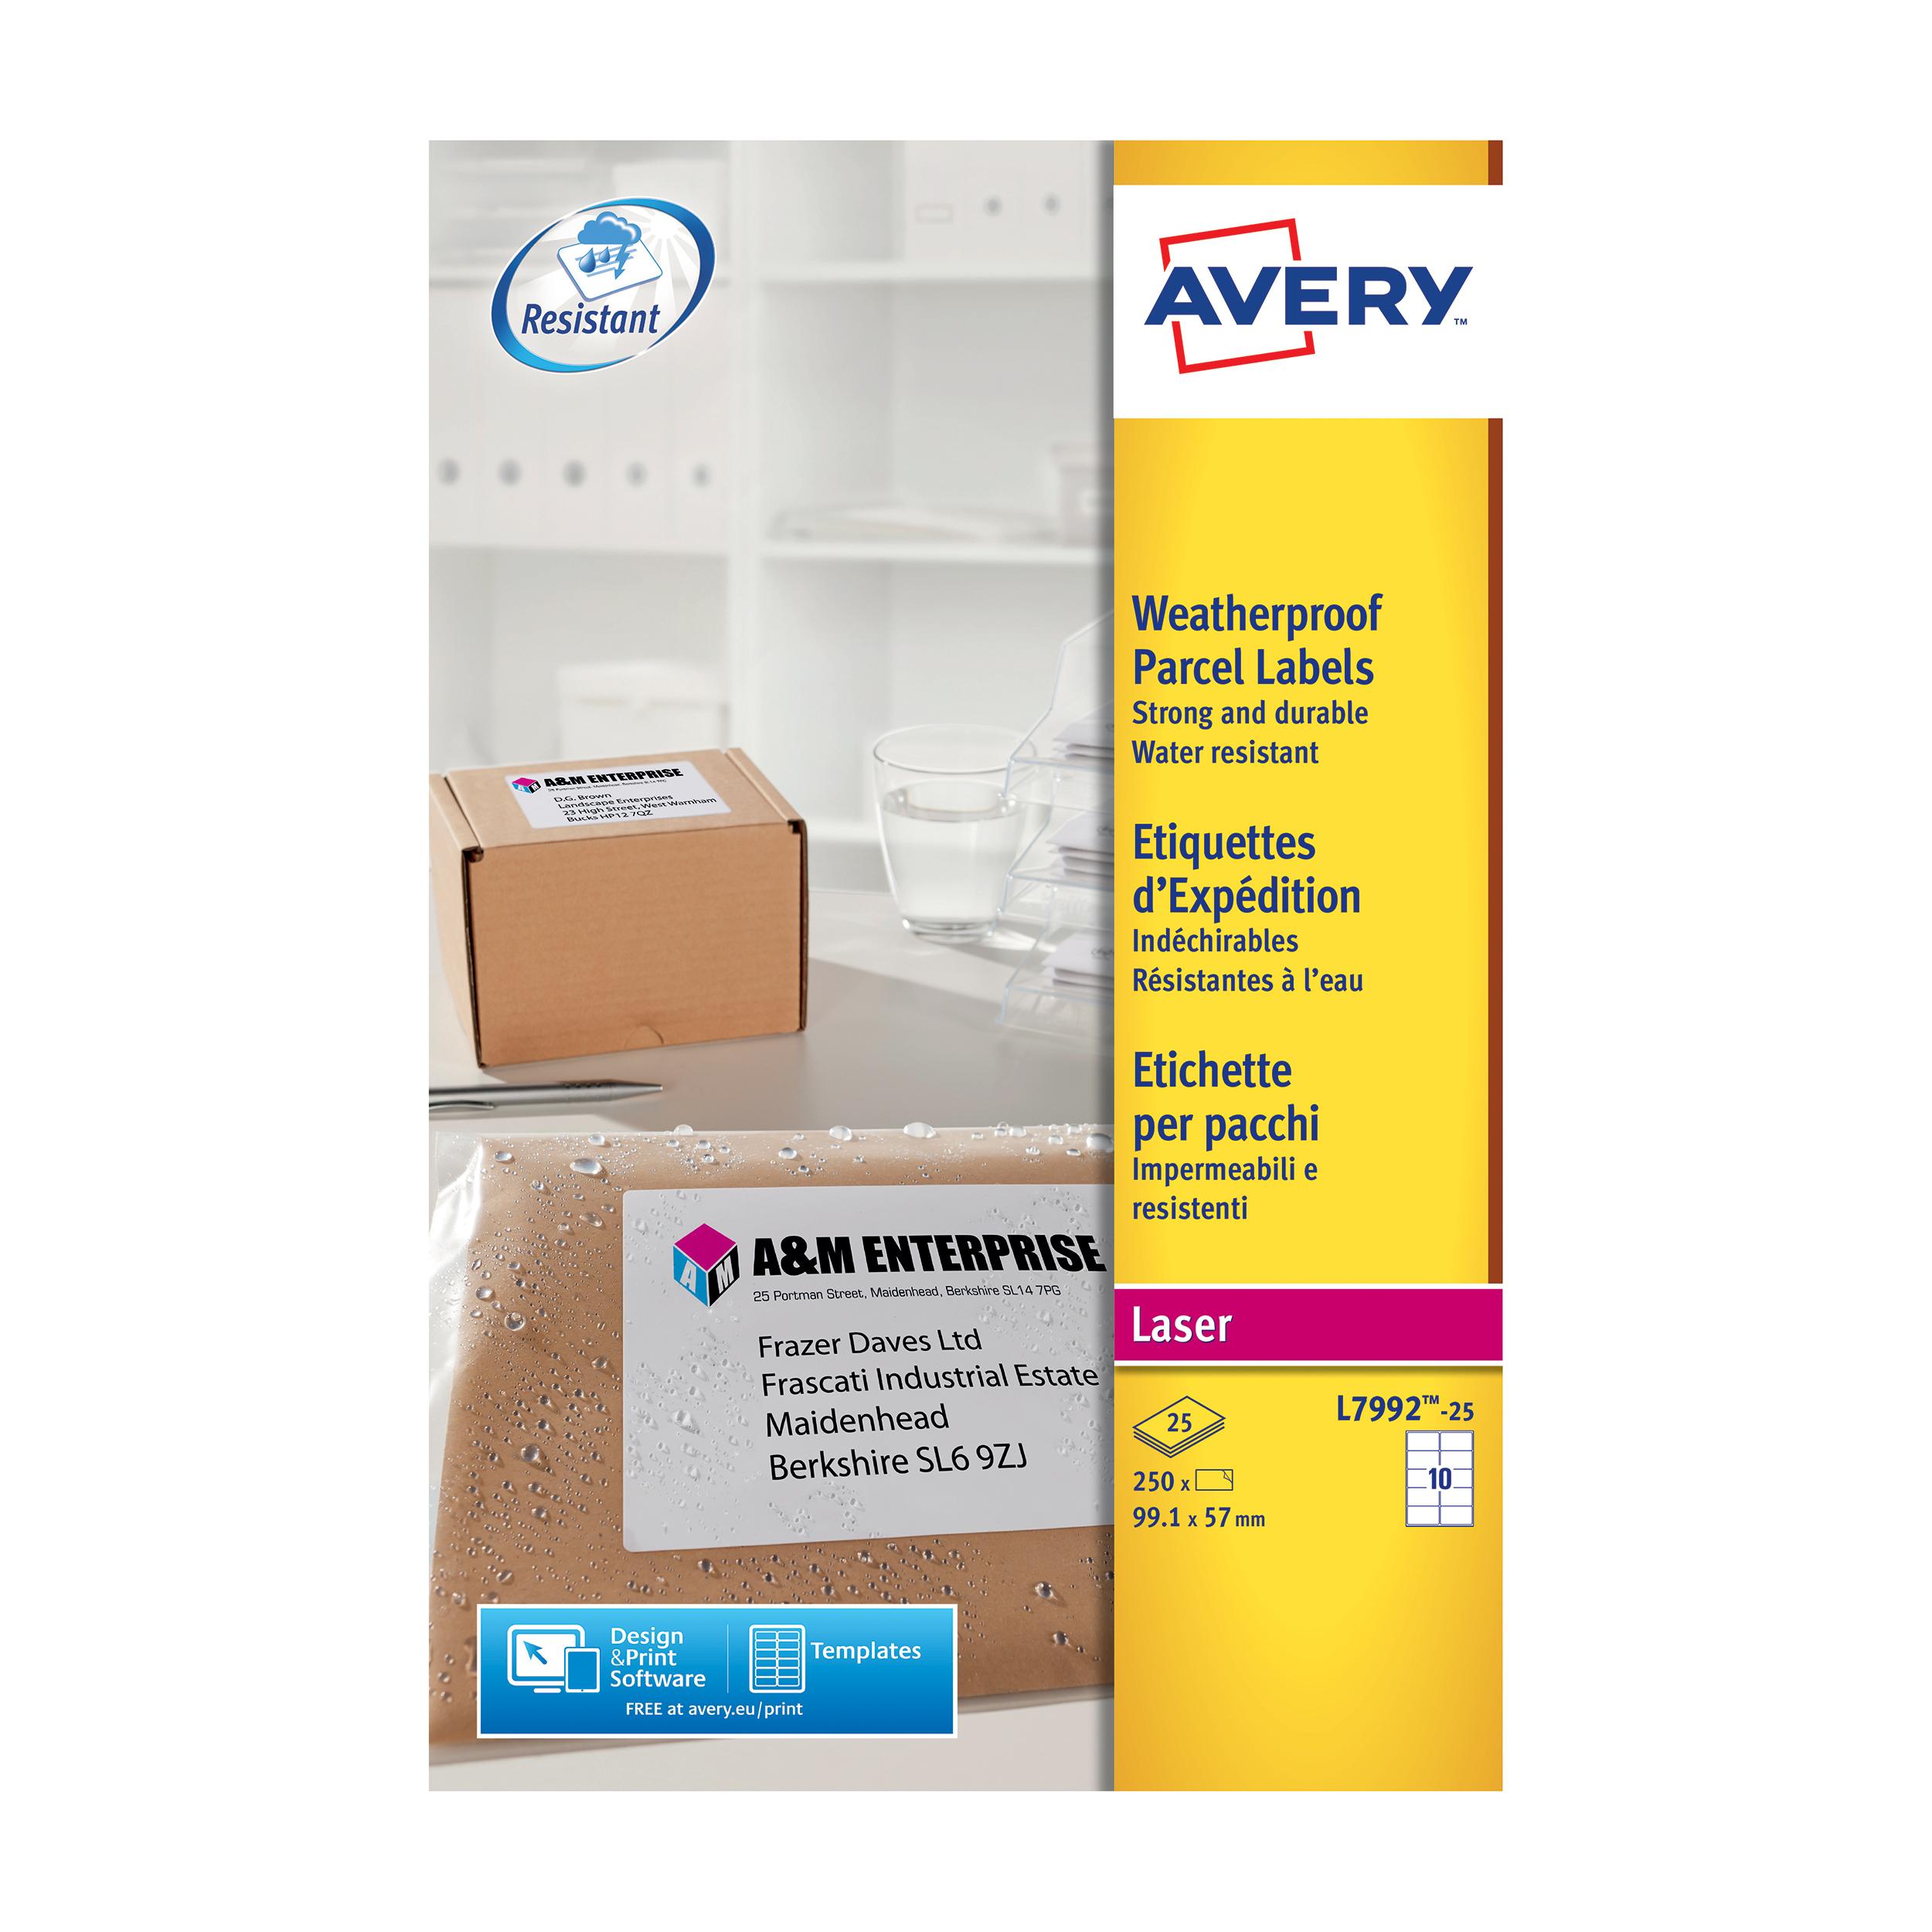 avery parcel labels weatherproof laser 10 per sheet 99 1x57mm white